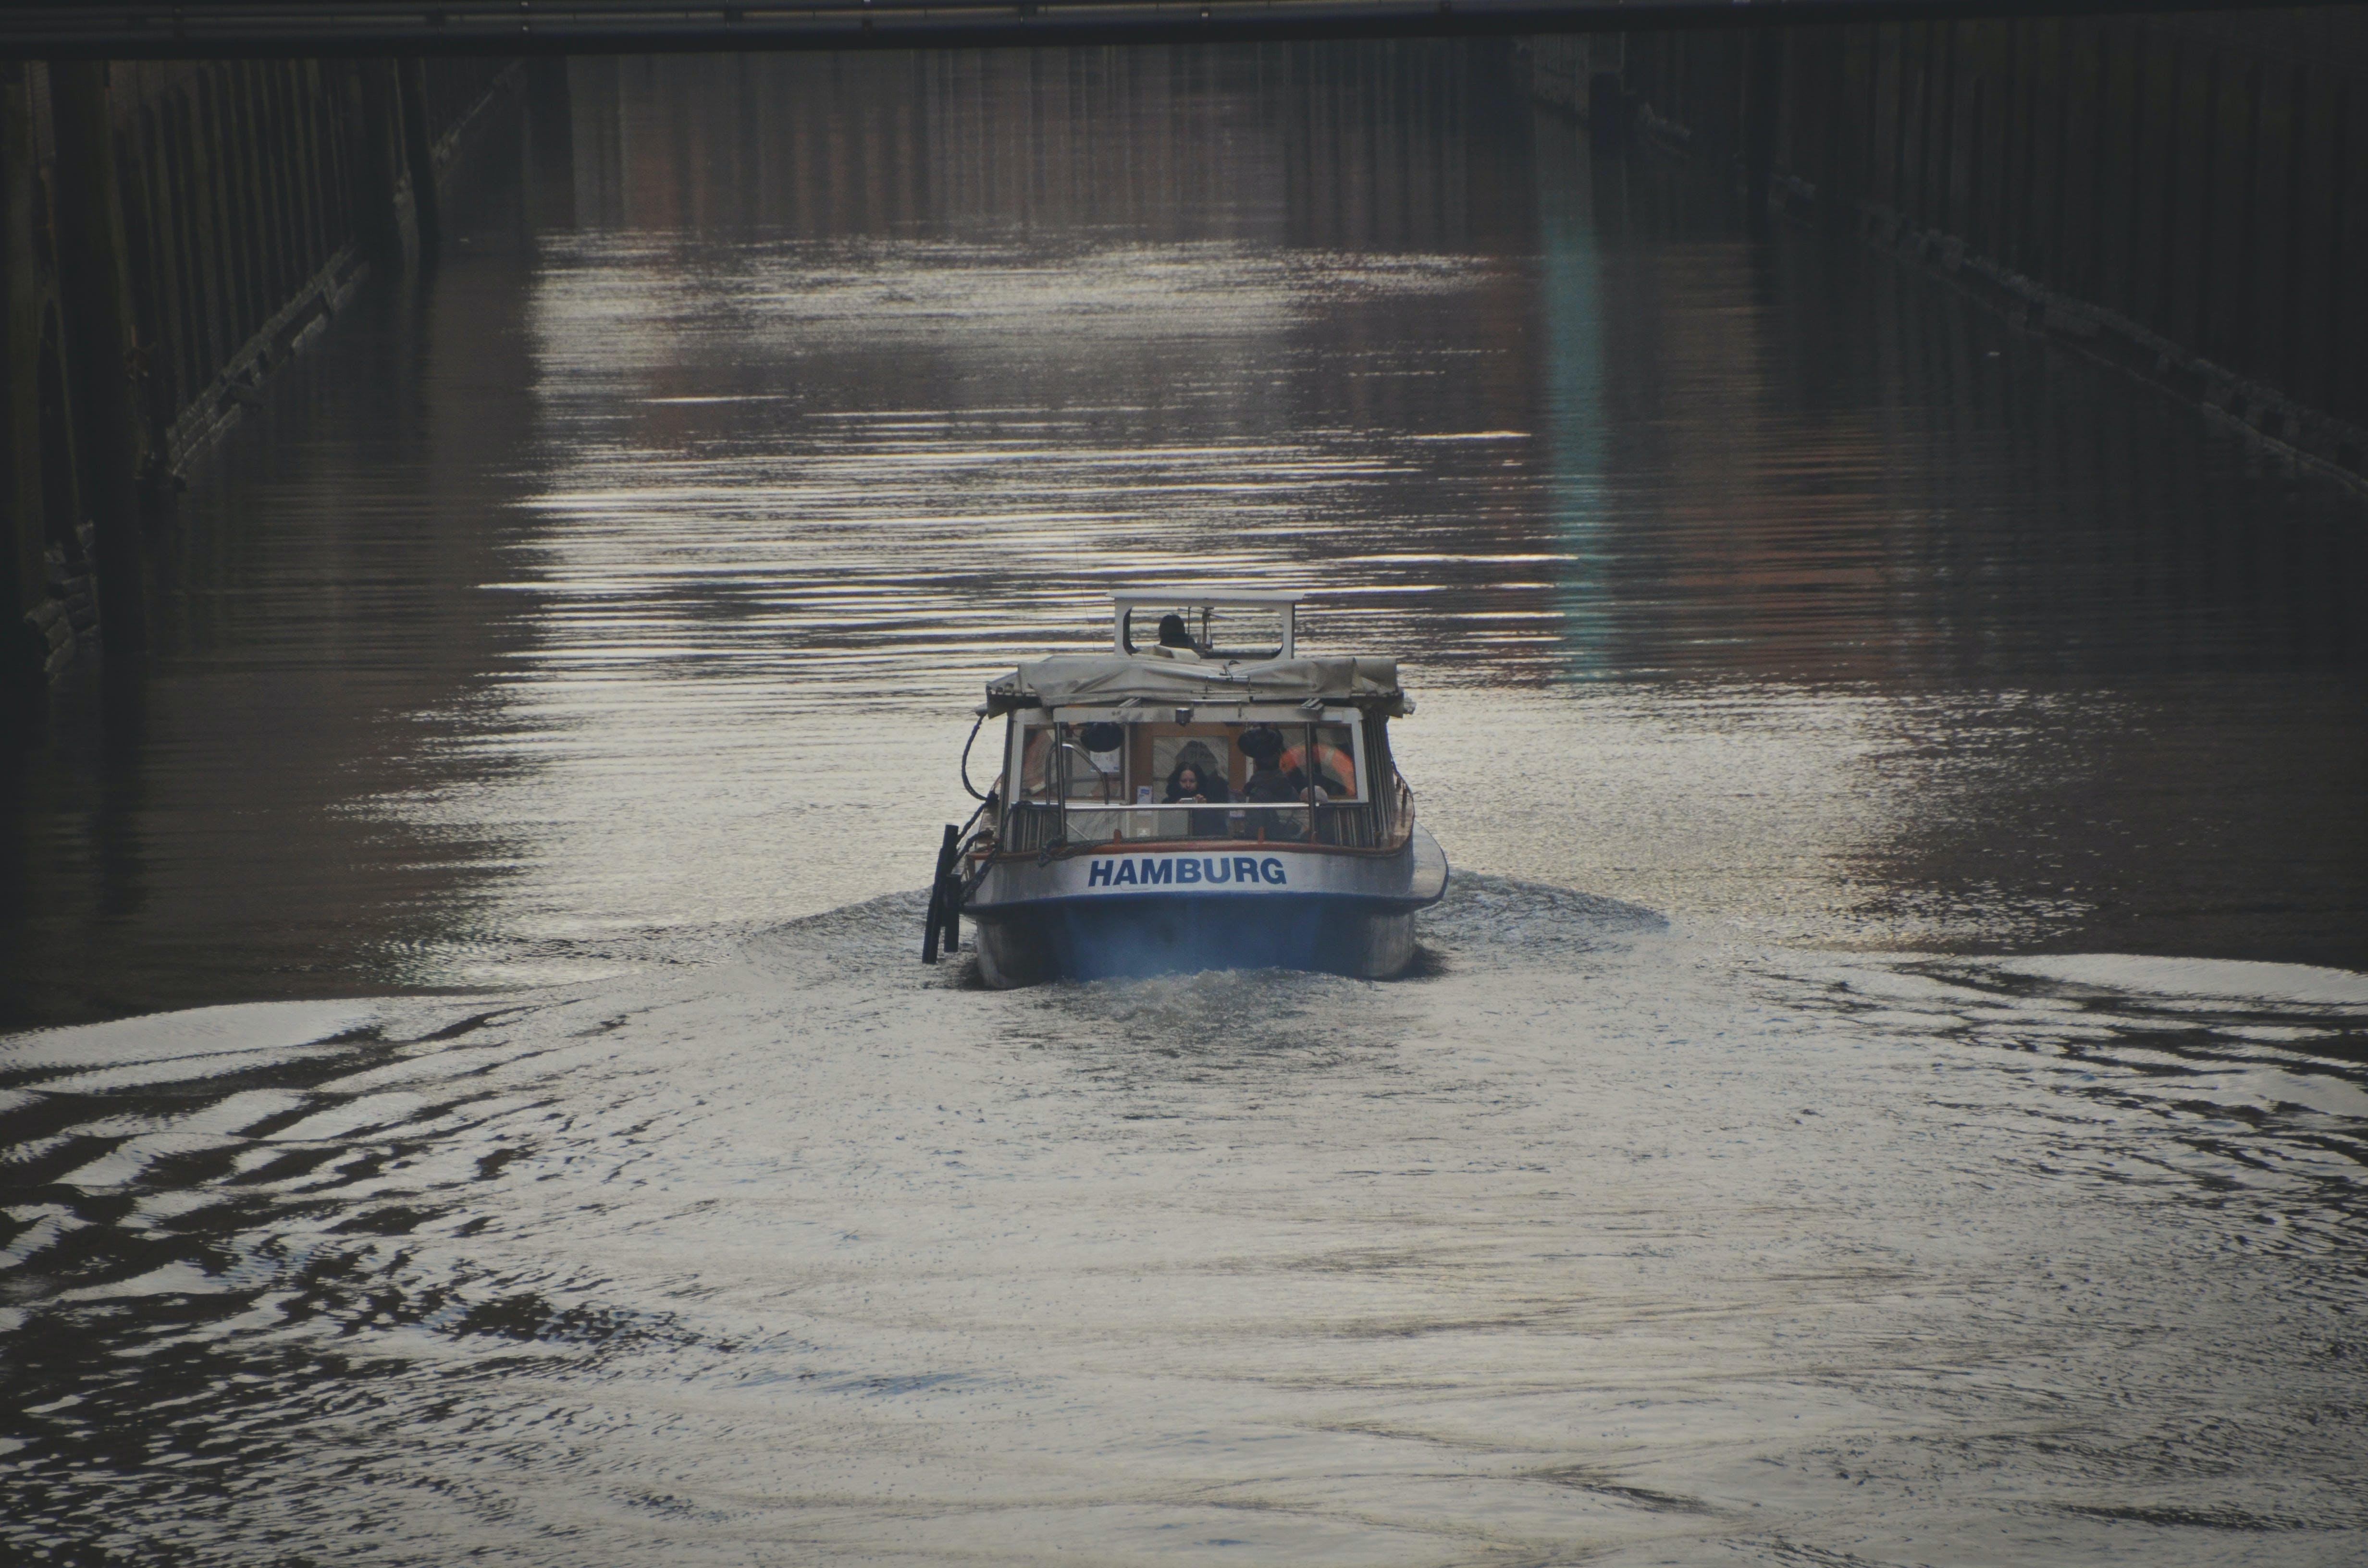 Kostenloses Stock Foto zu boat, channel, hamburg